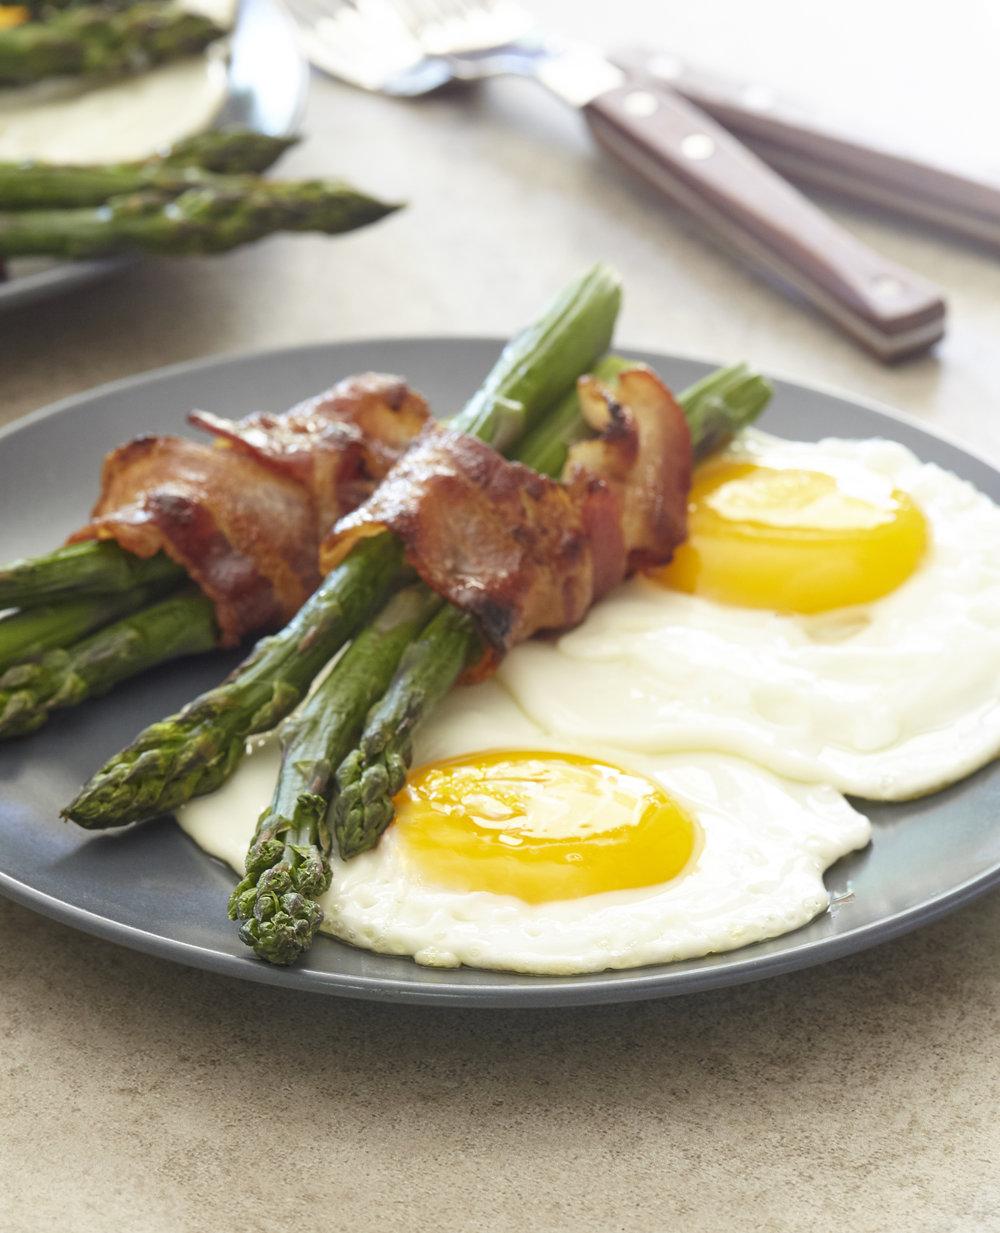 Asparagus_Wrapped_Bacon_Bacon_&_Butter.jpg